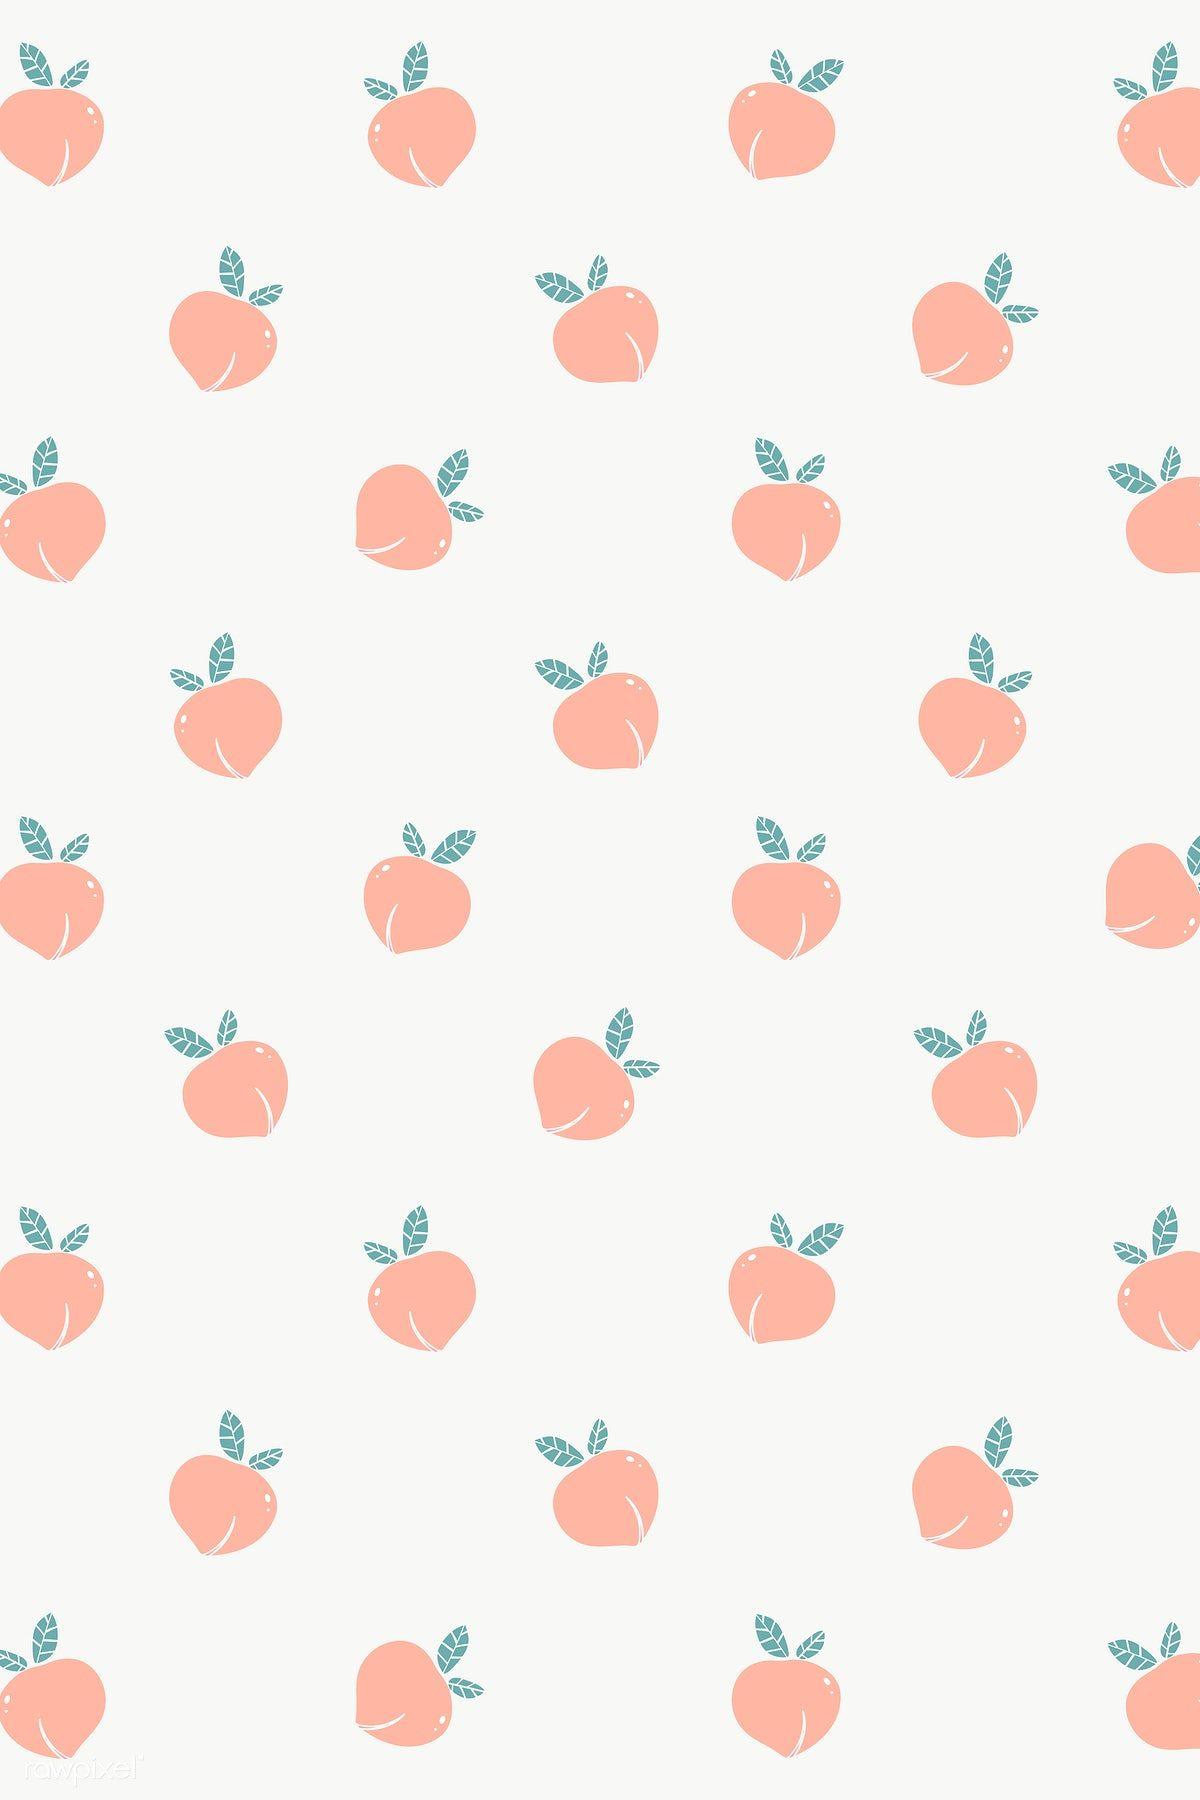 53 Ideas Aesthetic Wallpaper Pastel Ipad For 2019 Cute Screen Savers Soft Wallpaper Wallpaper Iphone Cute